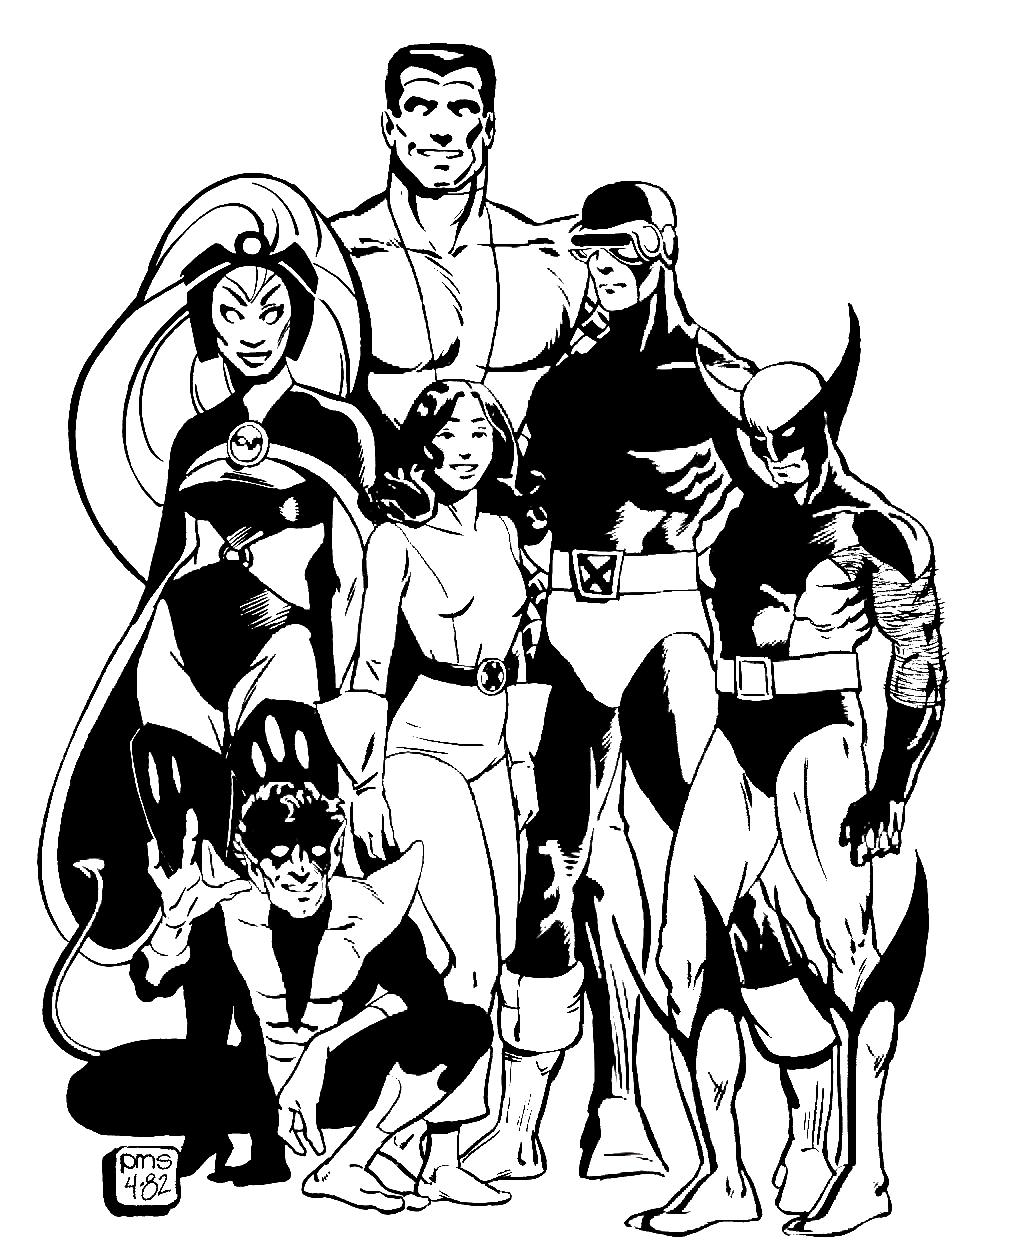 Wolverine #7 (Superheroes) – Printable coloring pages